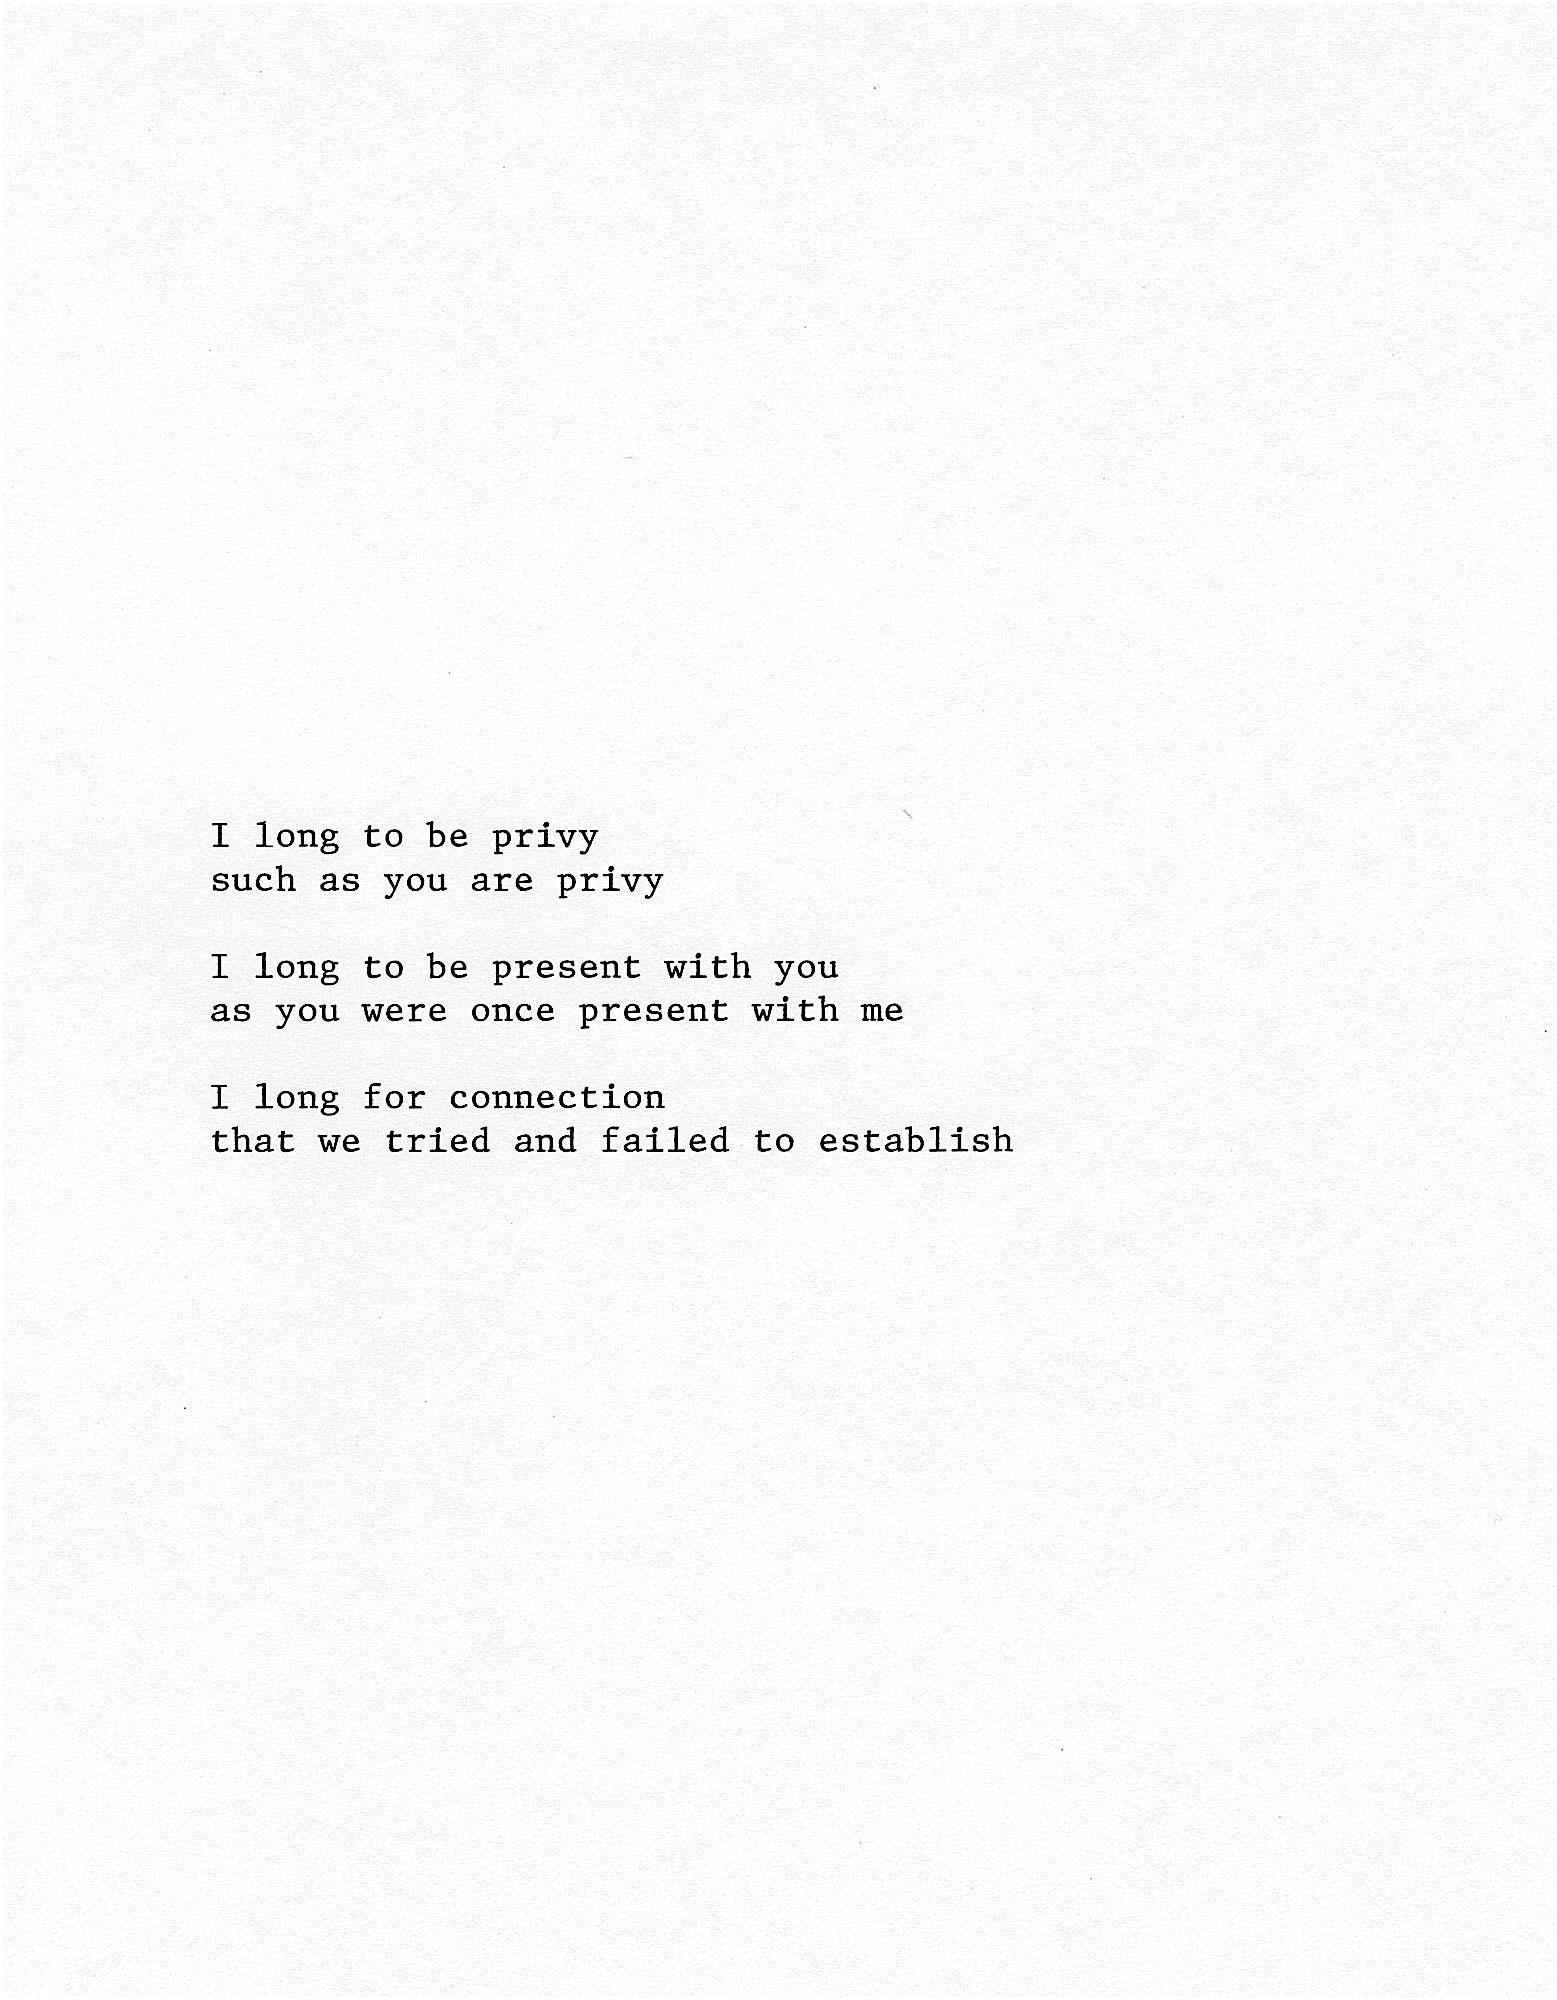 poem002.jpg